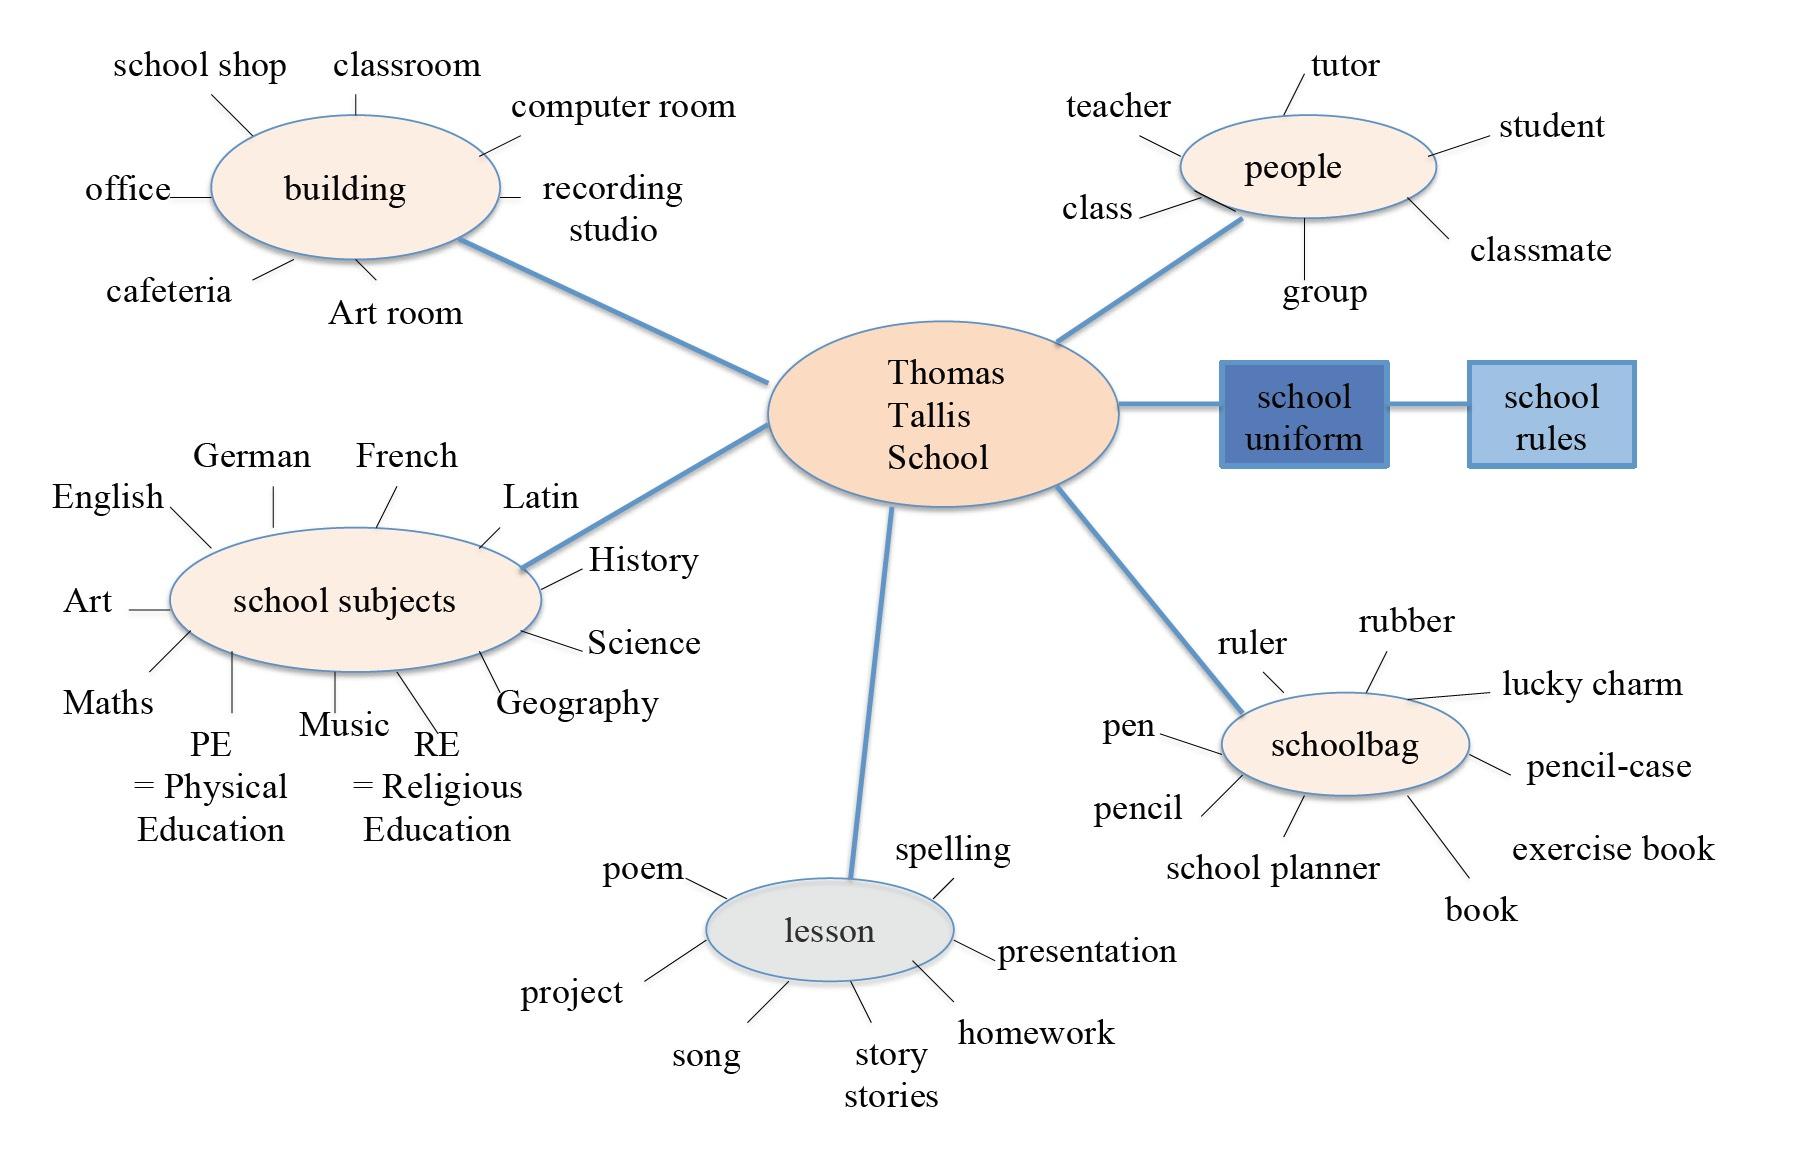 GL1 U2 Voc_school_m-map